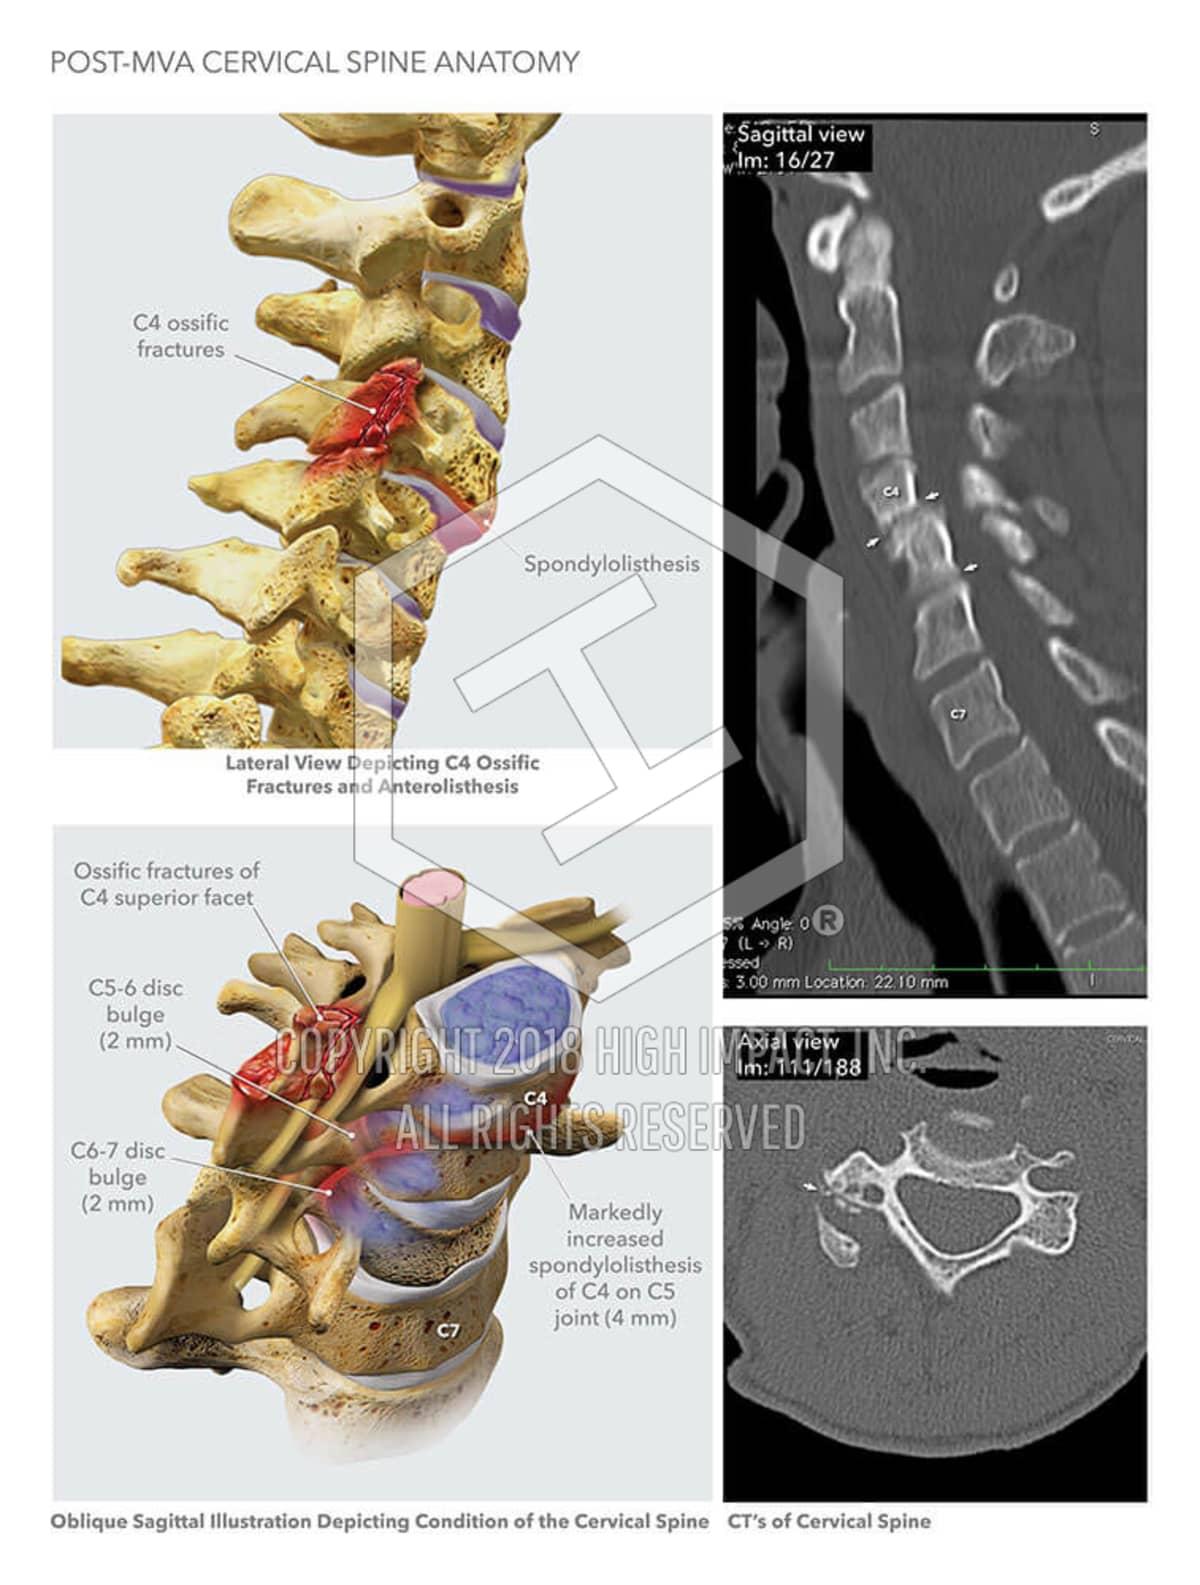 Post-MVA Cervical Spine Anatomy | High Impact® Visual